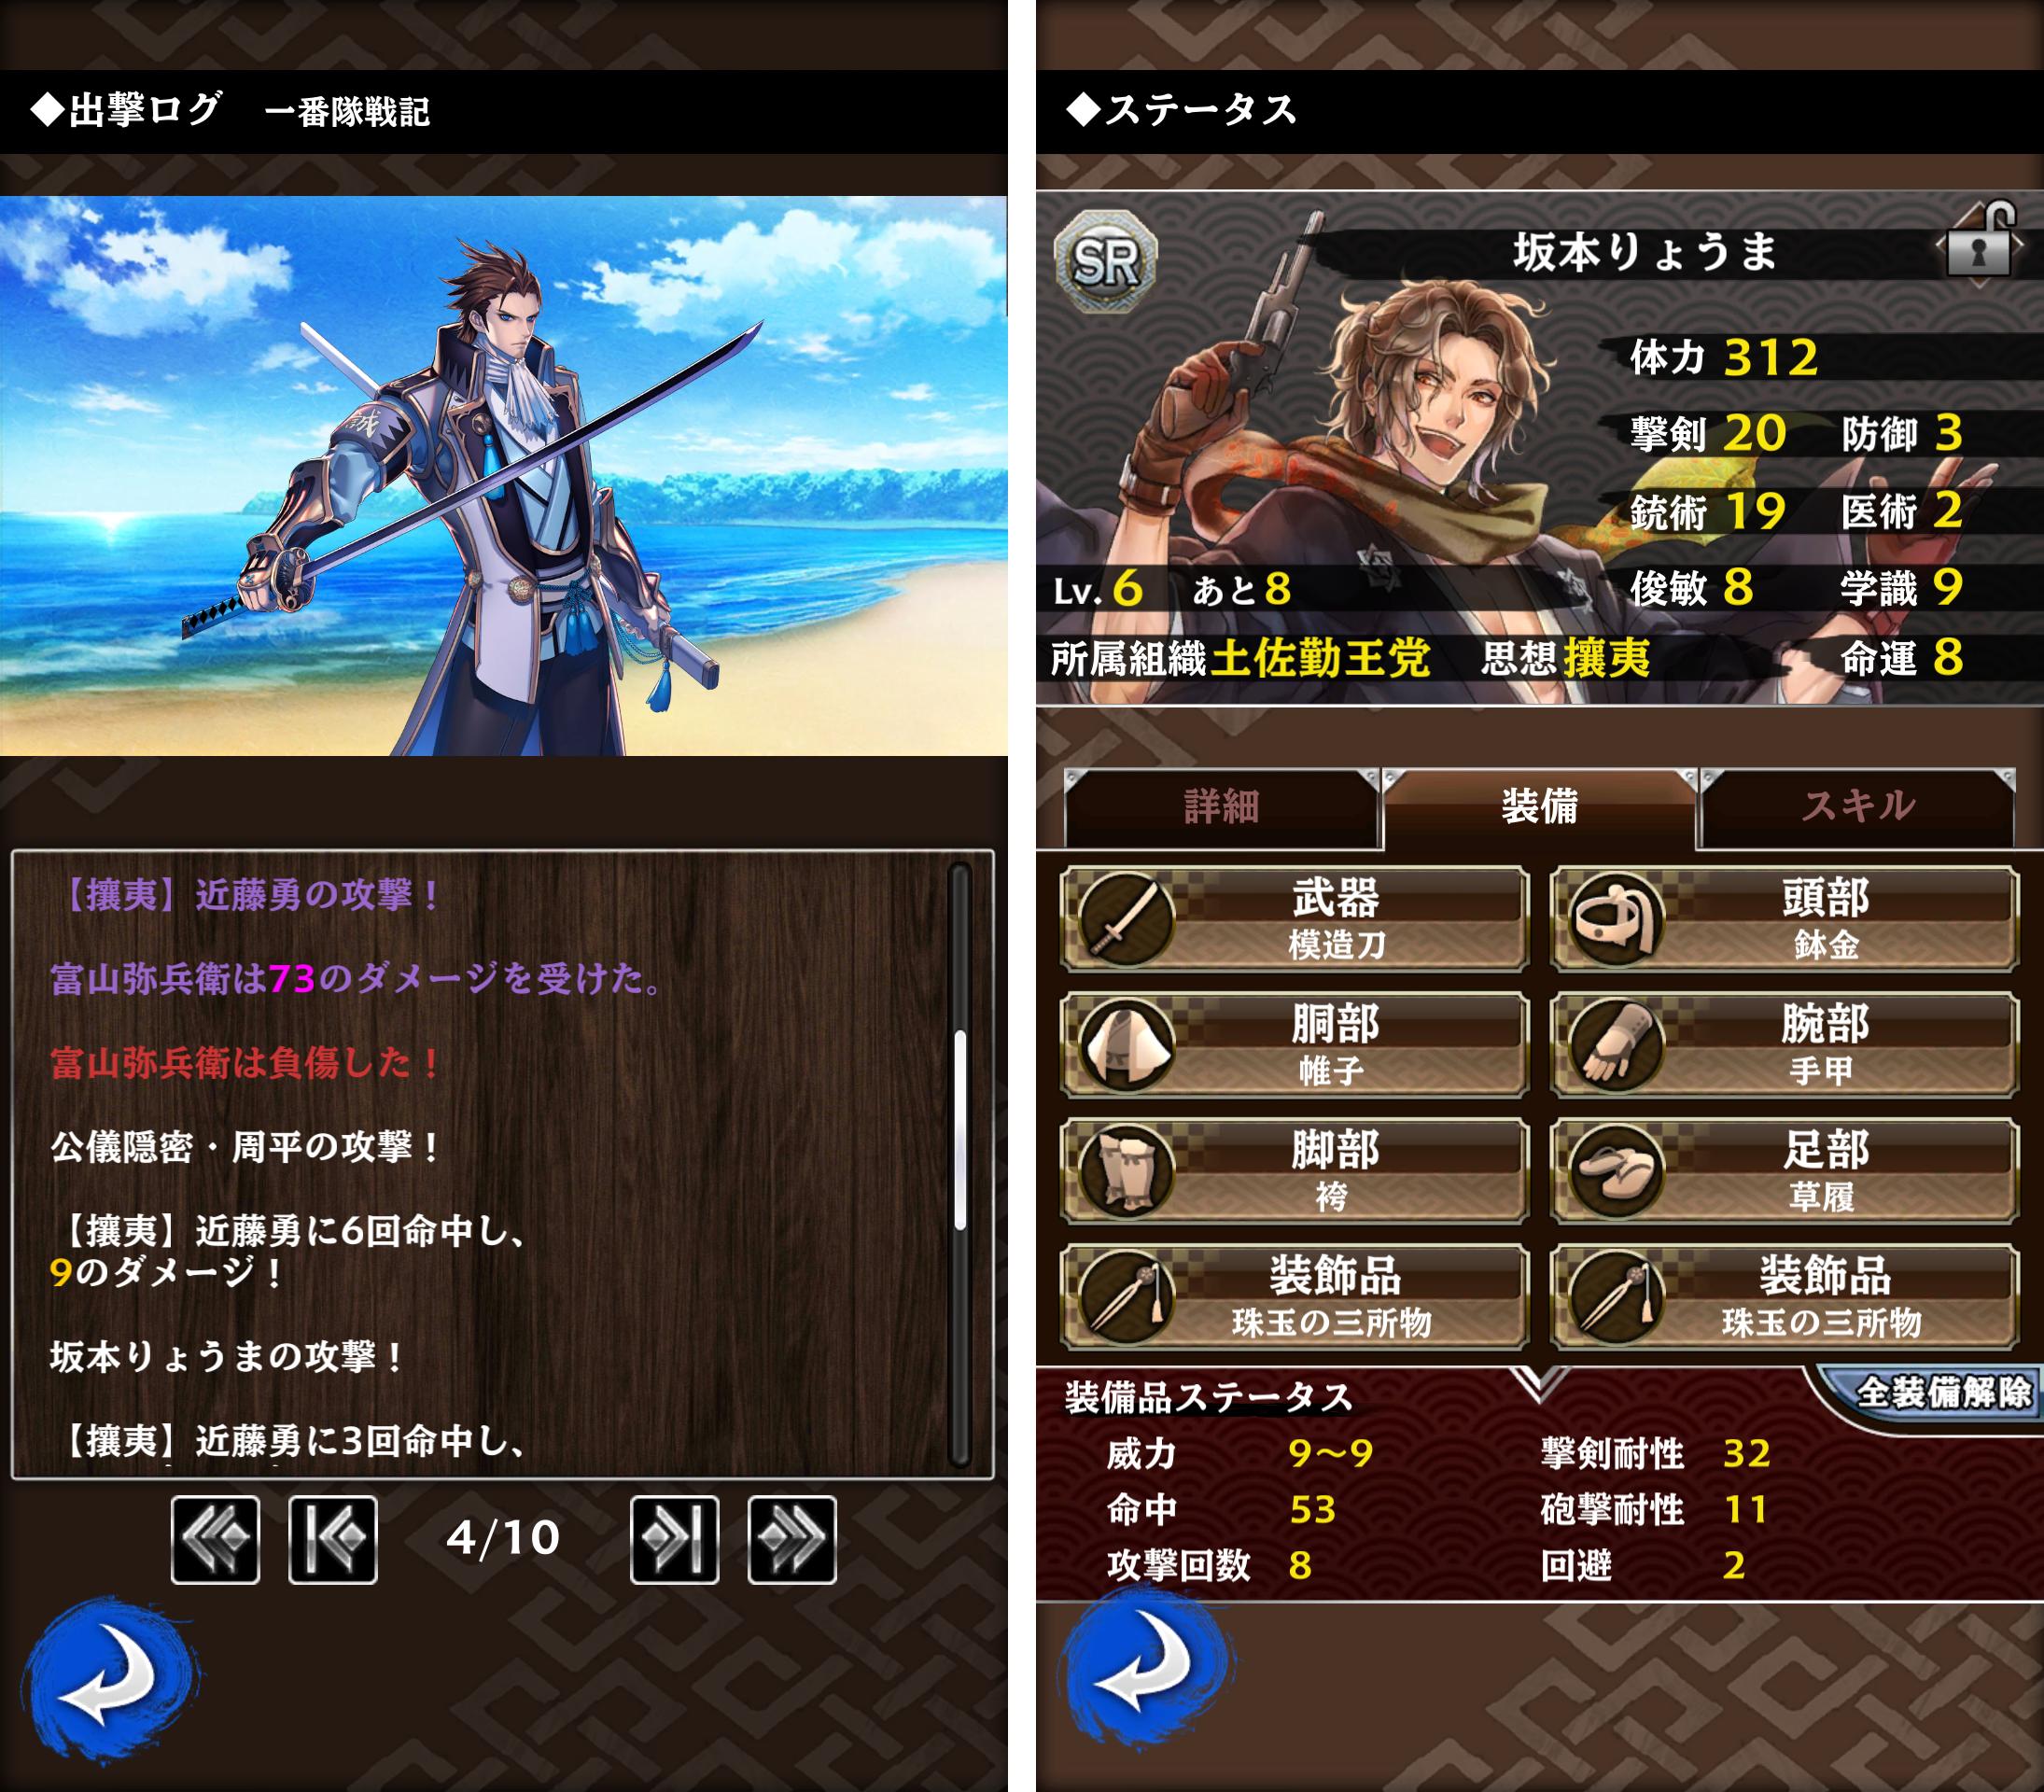 SAMURAI SCHEMA -幕末維新戦記- androidアプリスクリーンショット3